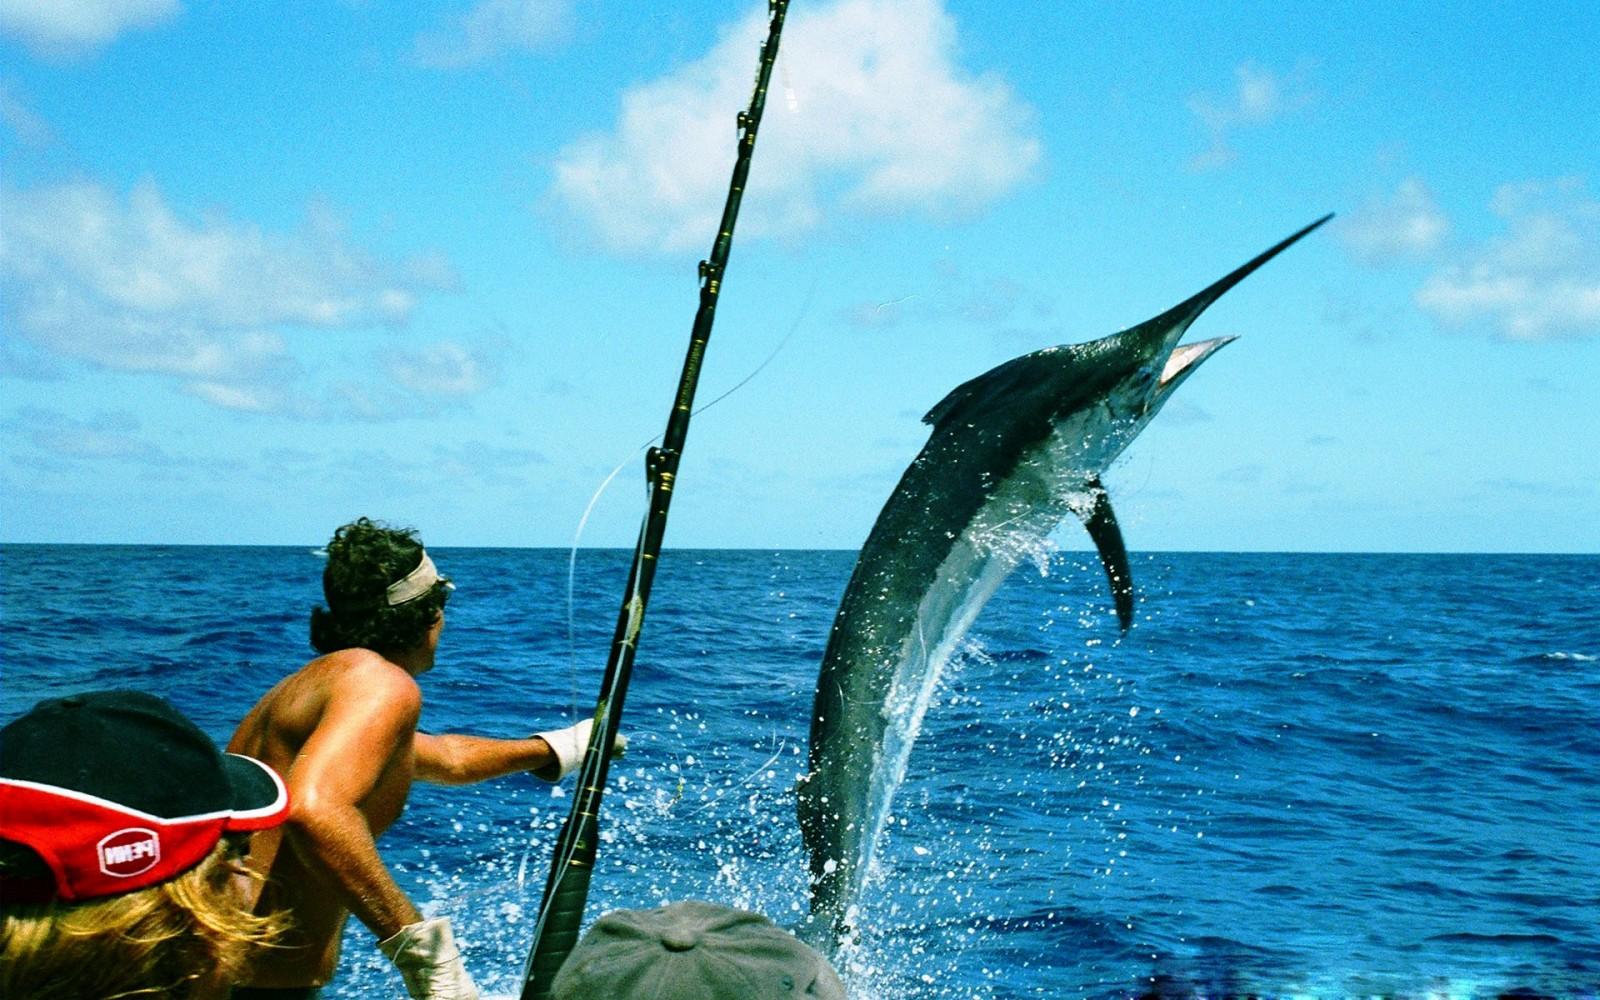 Marlin Fishing Wallpaper | www.imgkid.com - The Image Kid ...